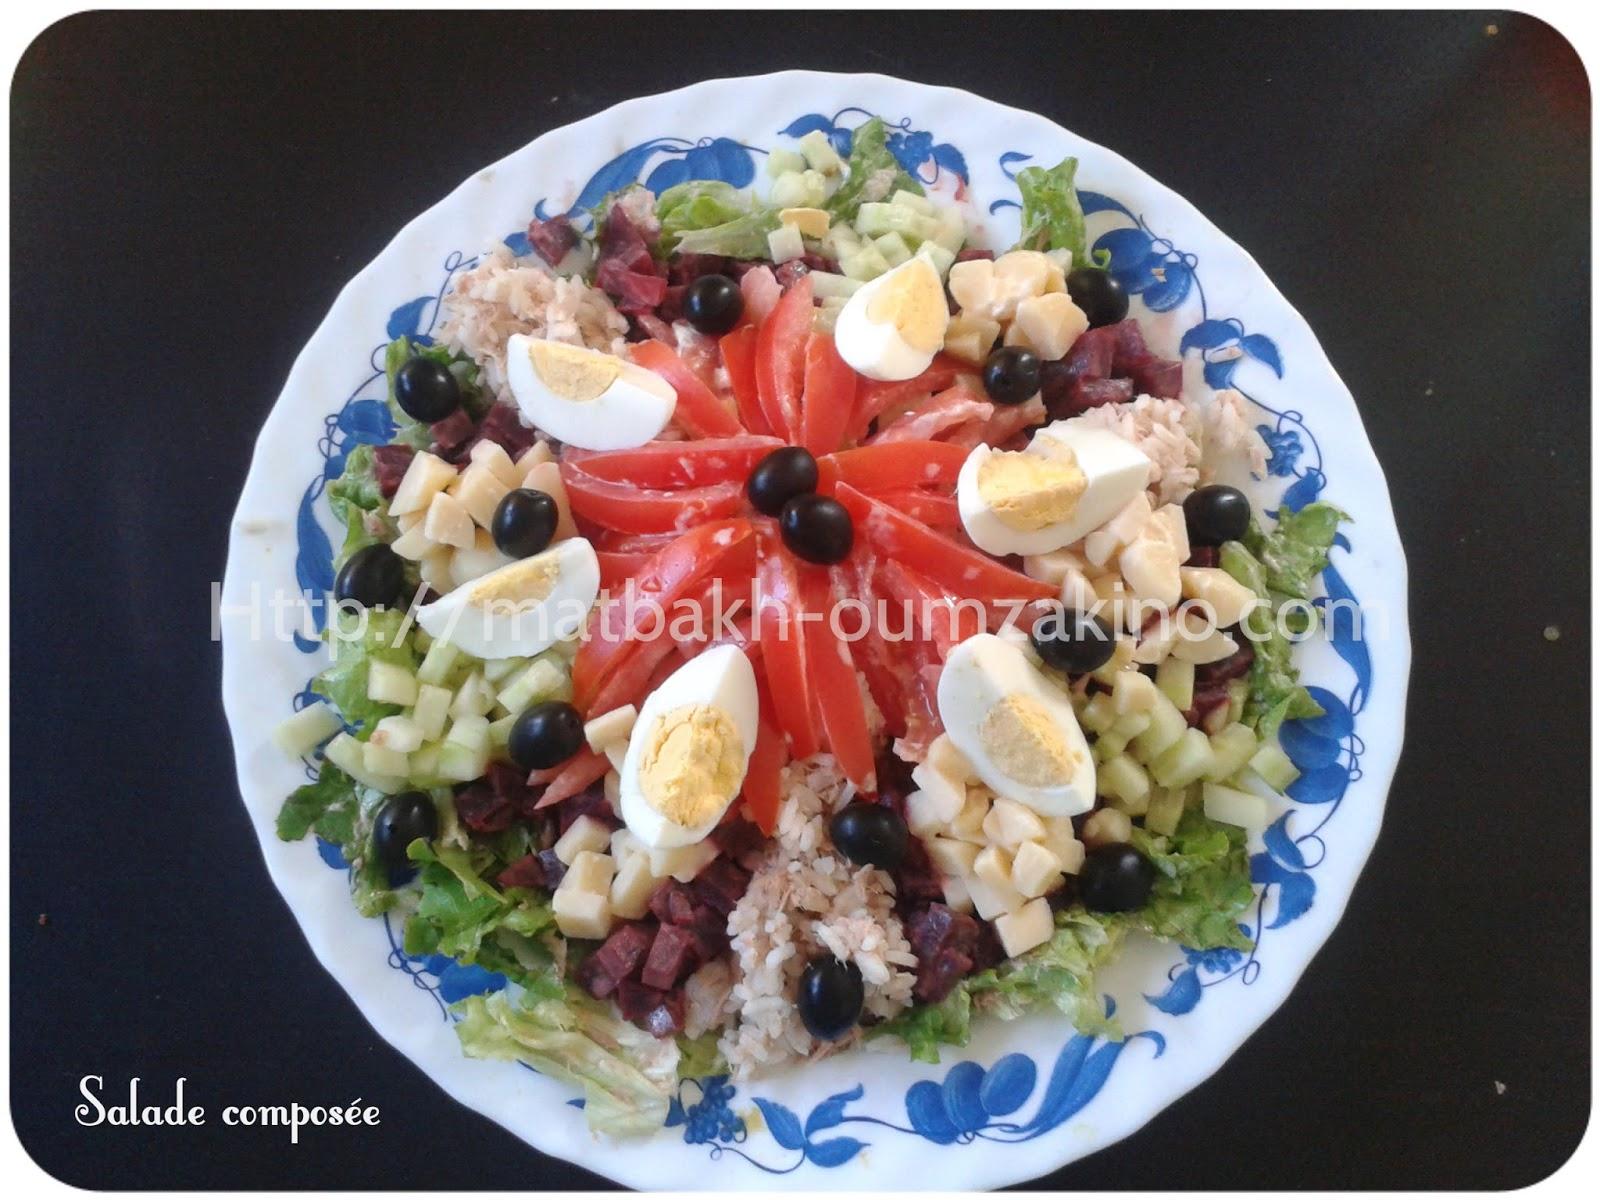 recettes de salades pour ramadan matbakh oumzakino. Black Bedroom Furniture Sets. Home Design Ideas